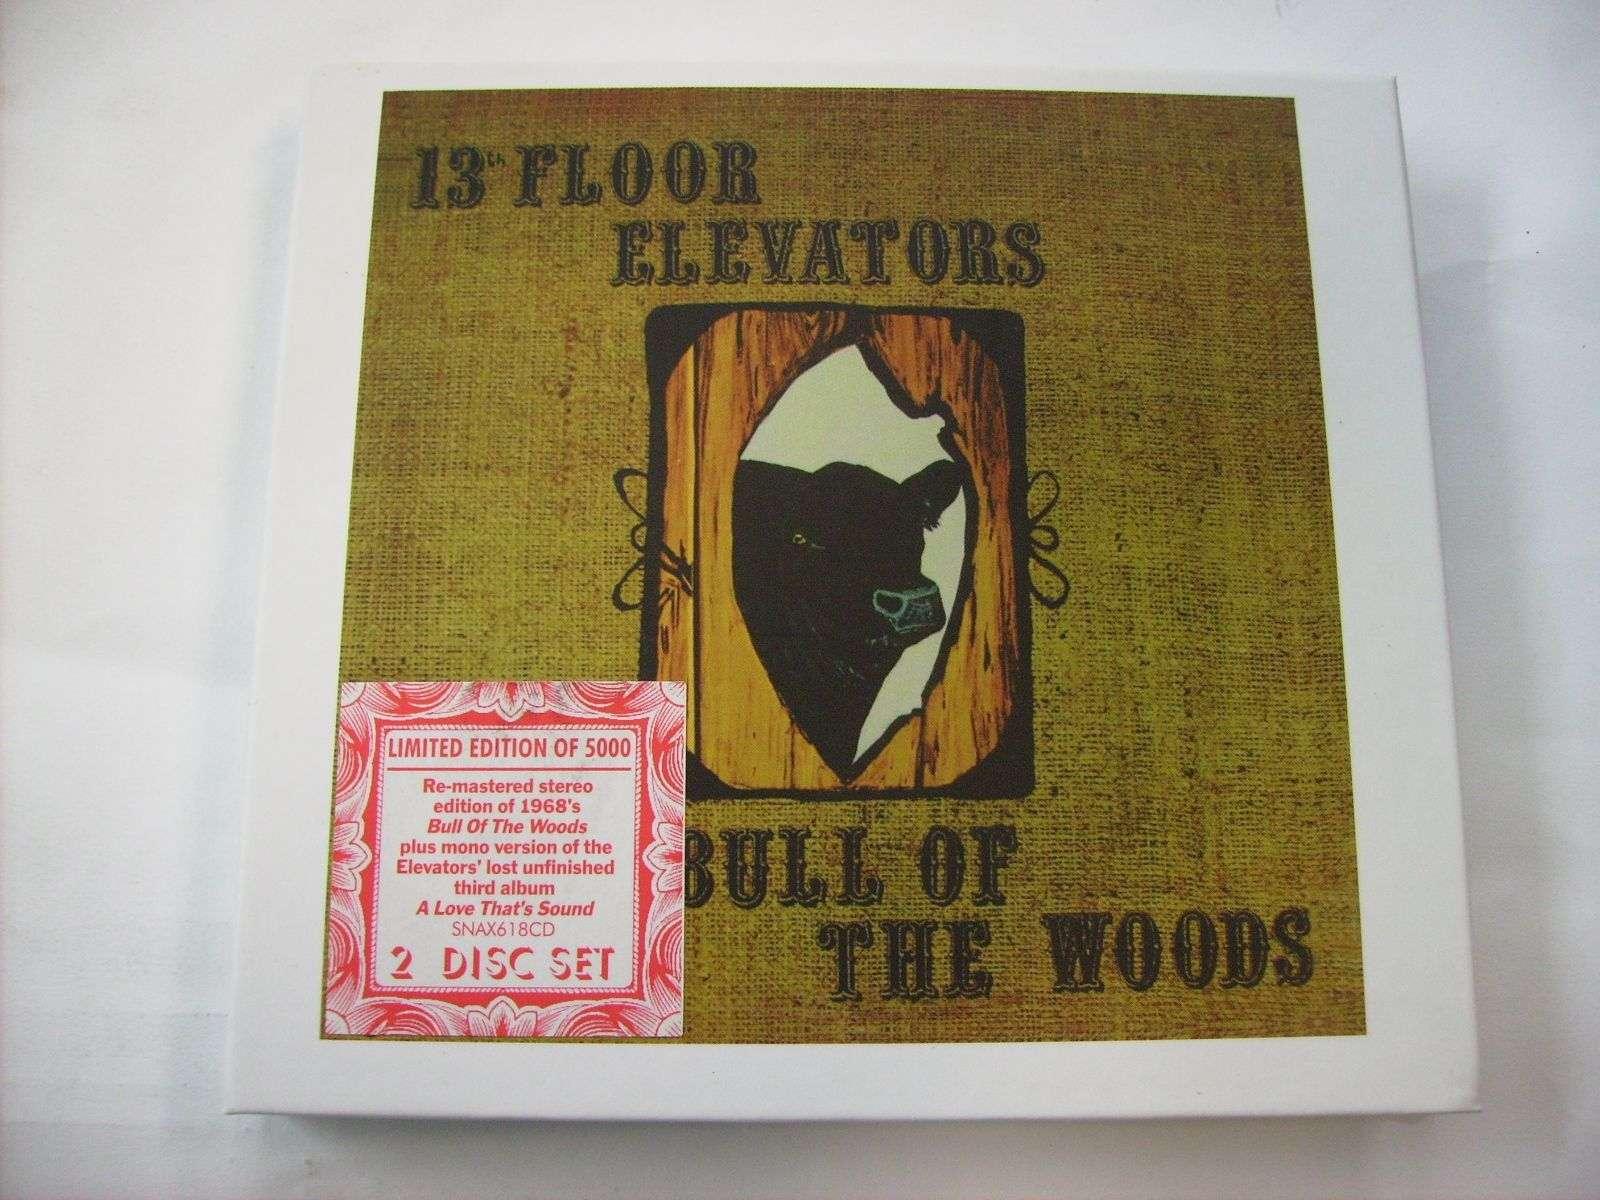 13th floor elevators bull of the woods records lps vinyl for 13th floor elevators vinyl box set